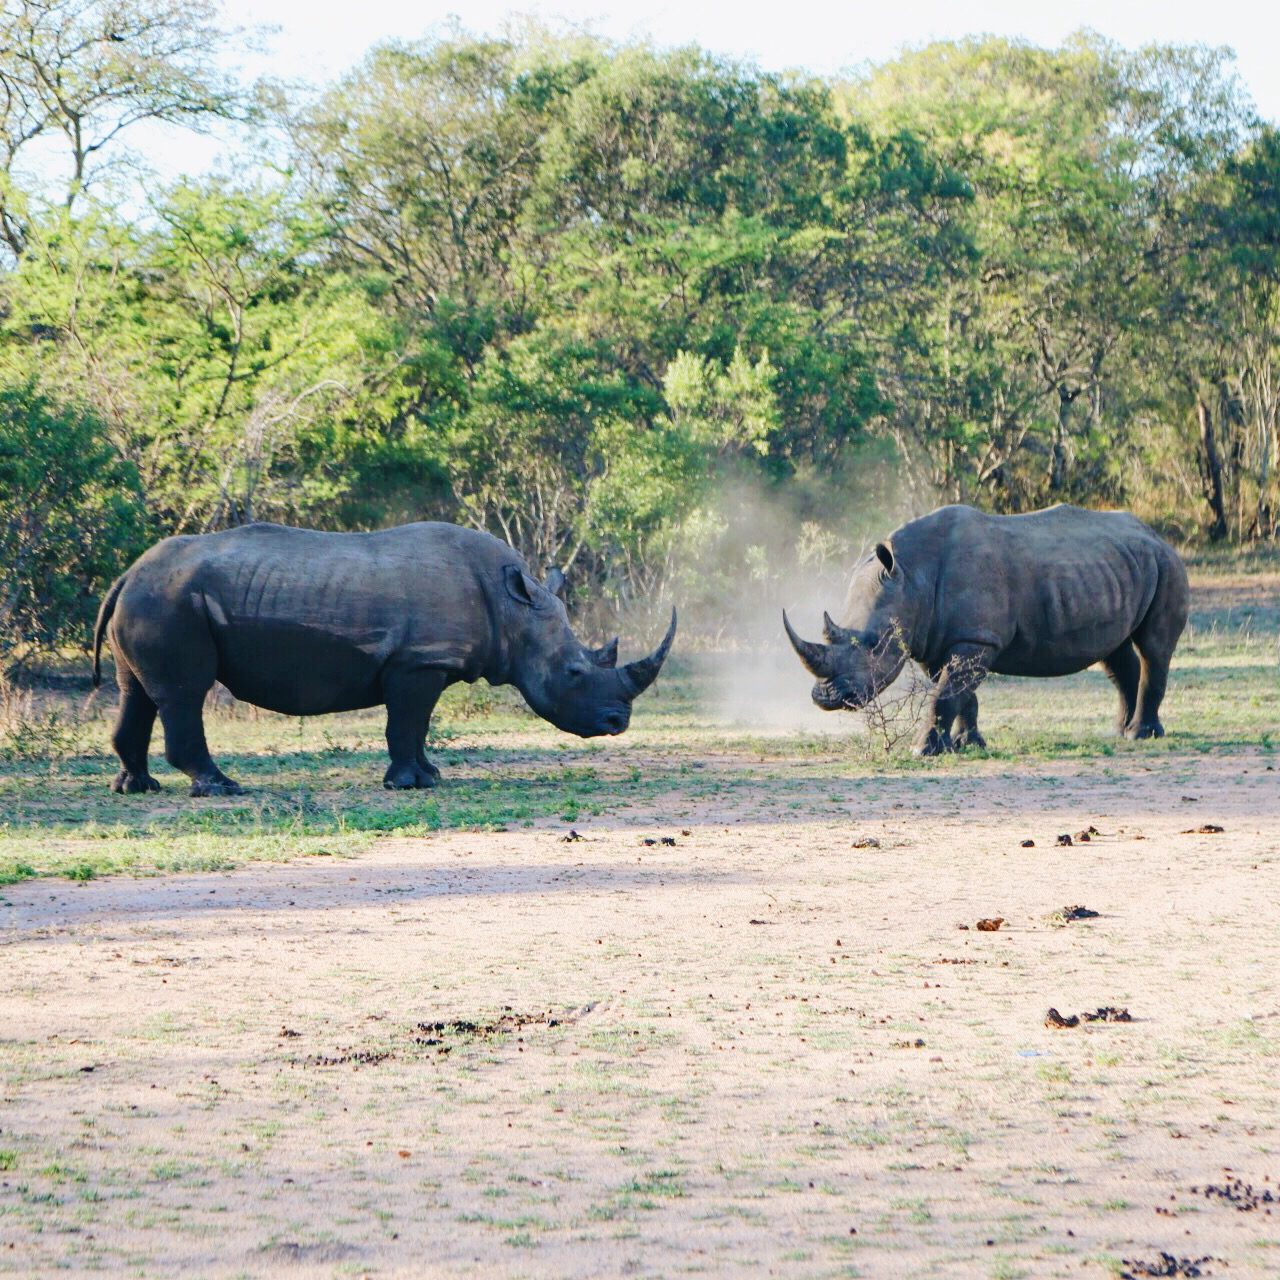 Safari In South Africa - A Photo Diary (12)